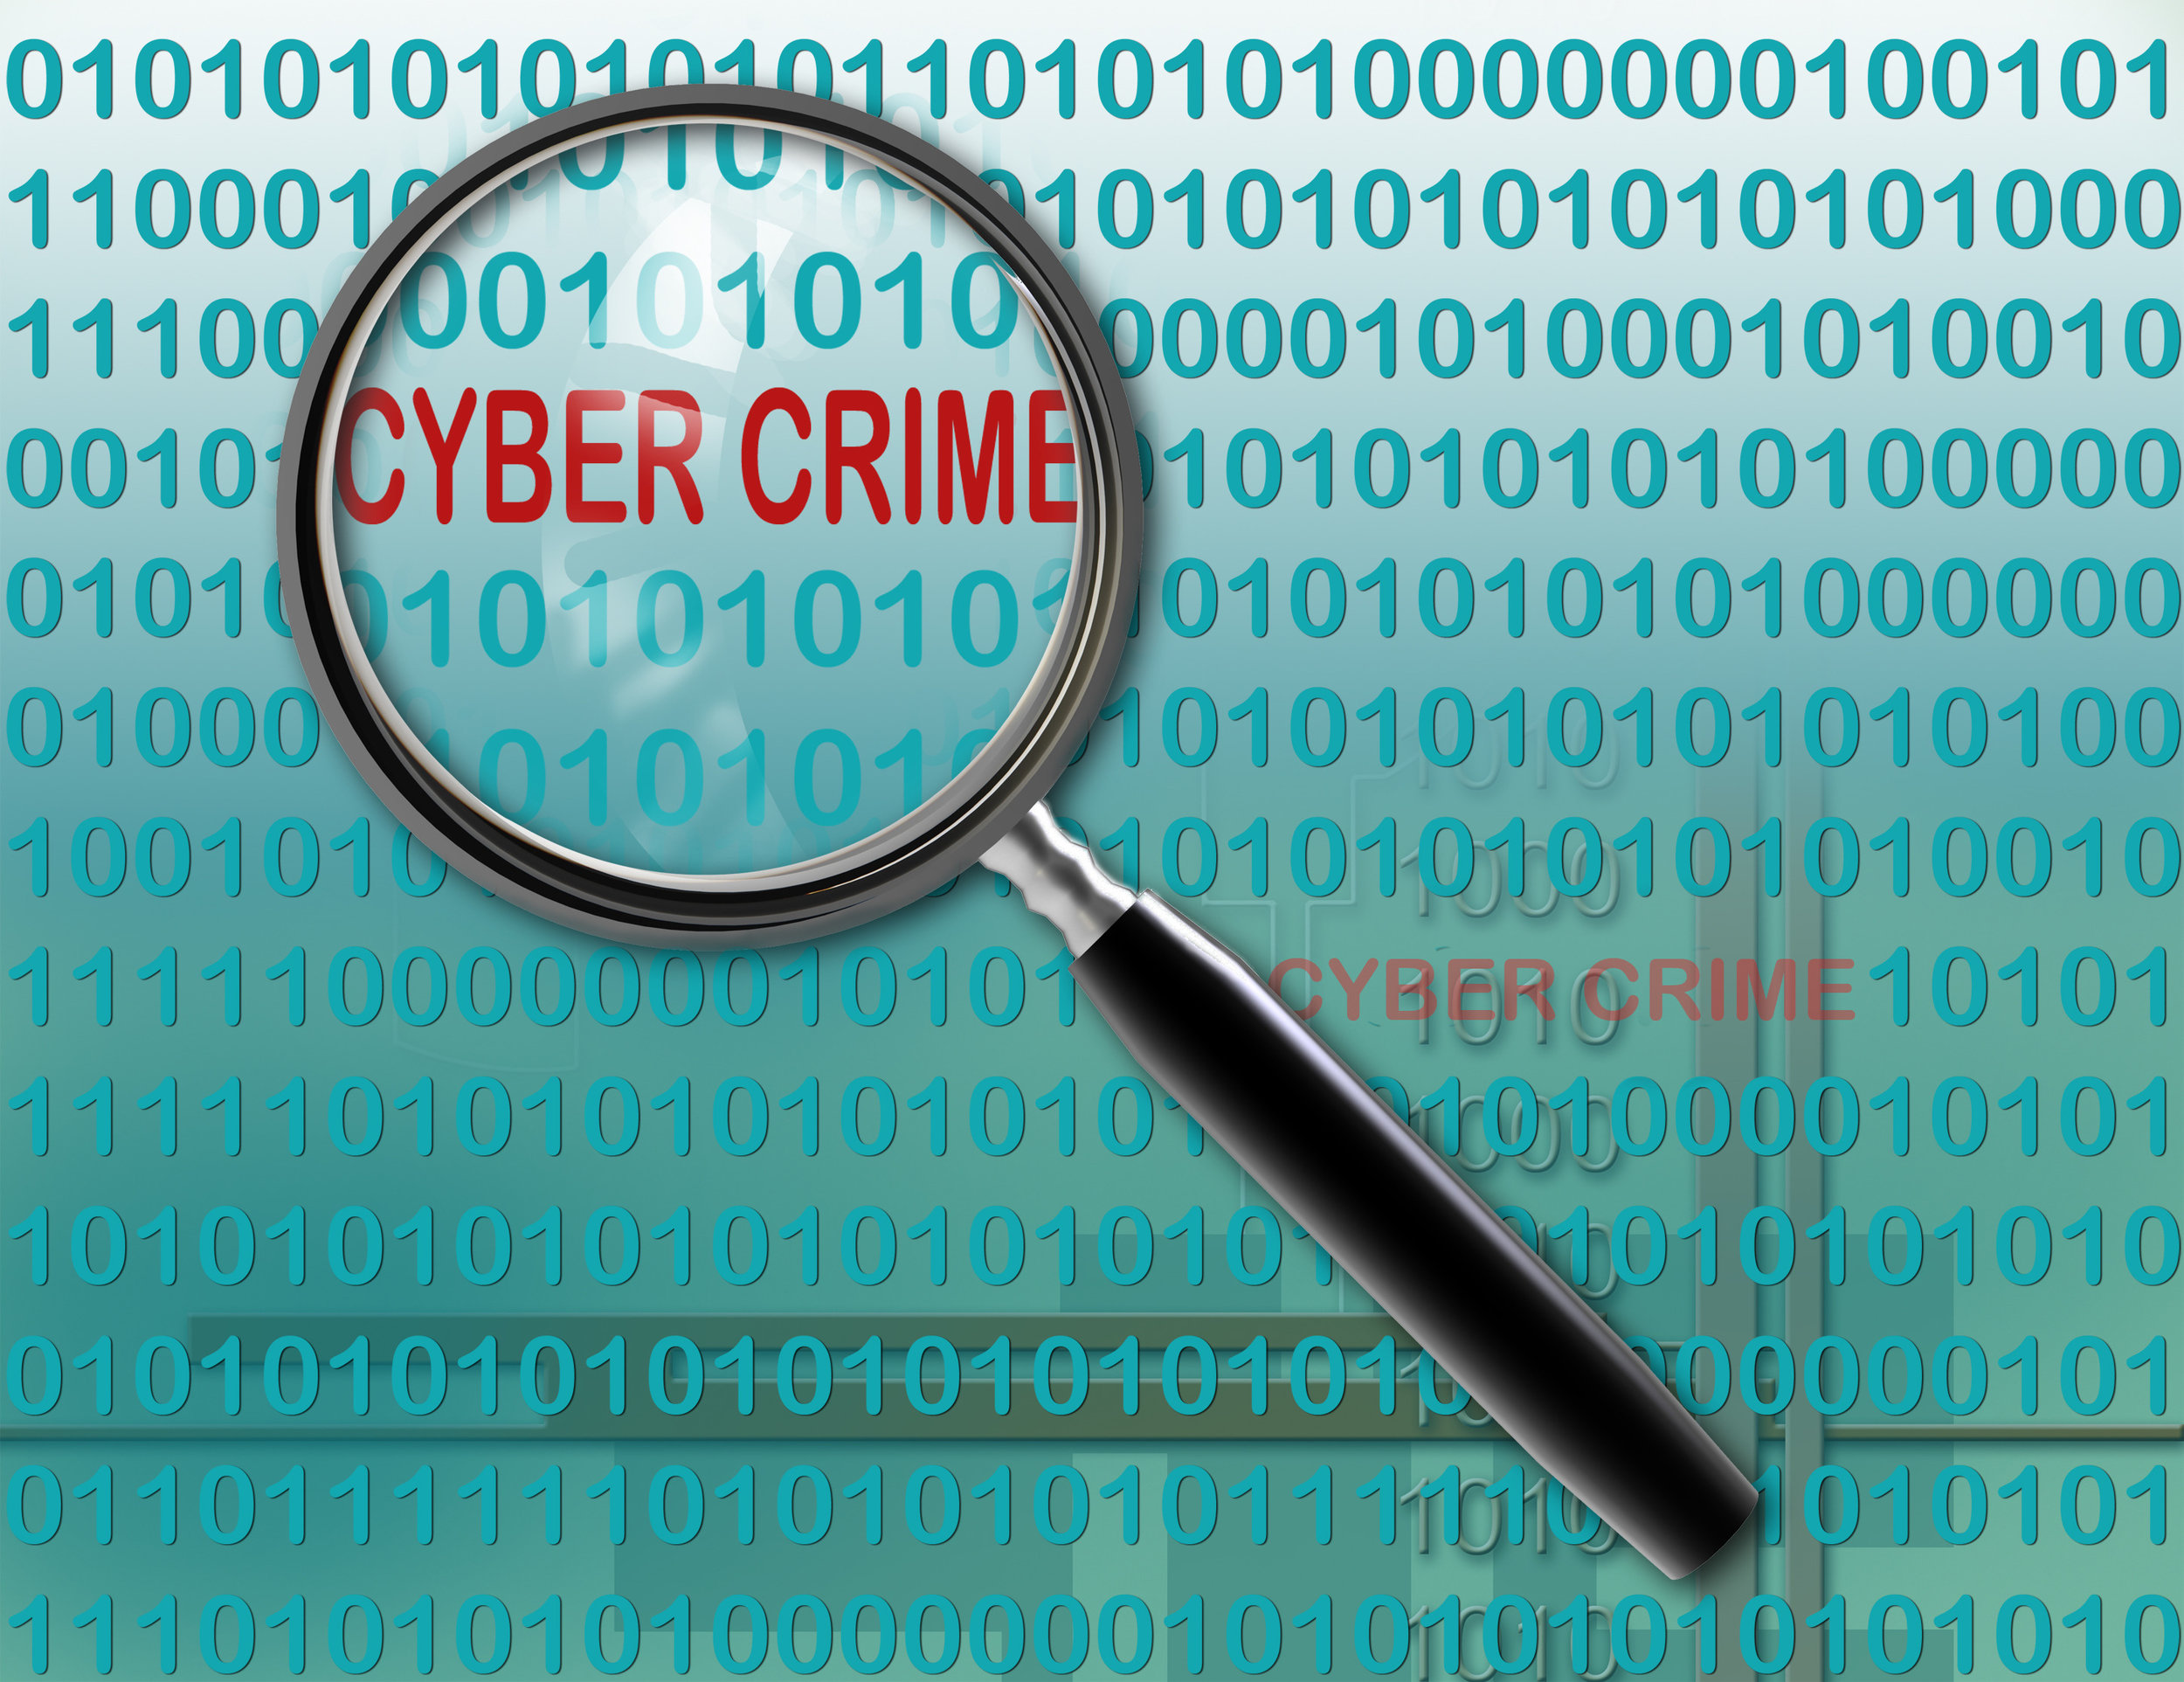 Working in the Cyber Crime Scene